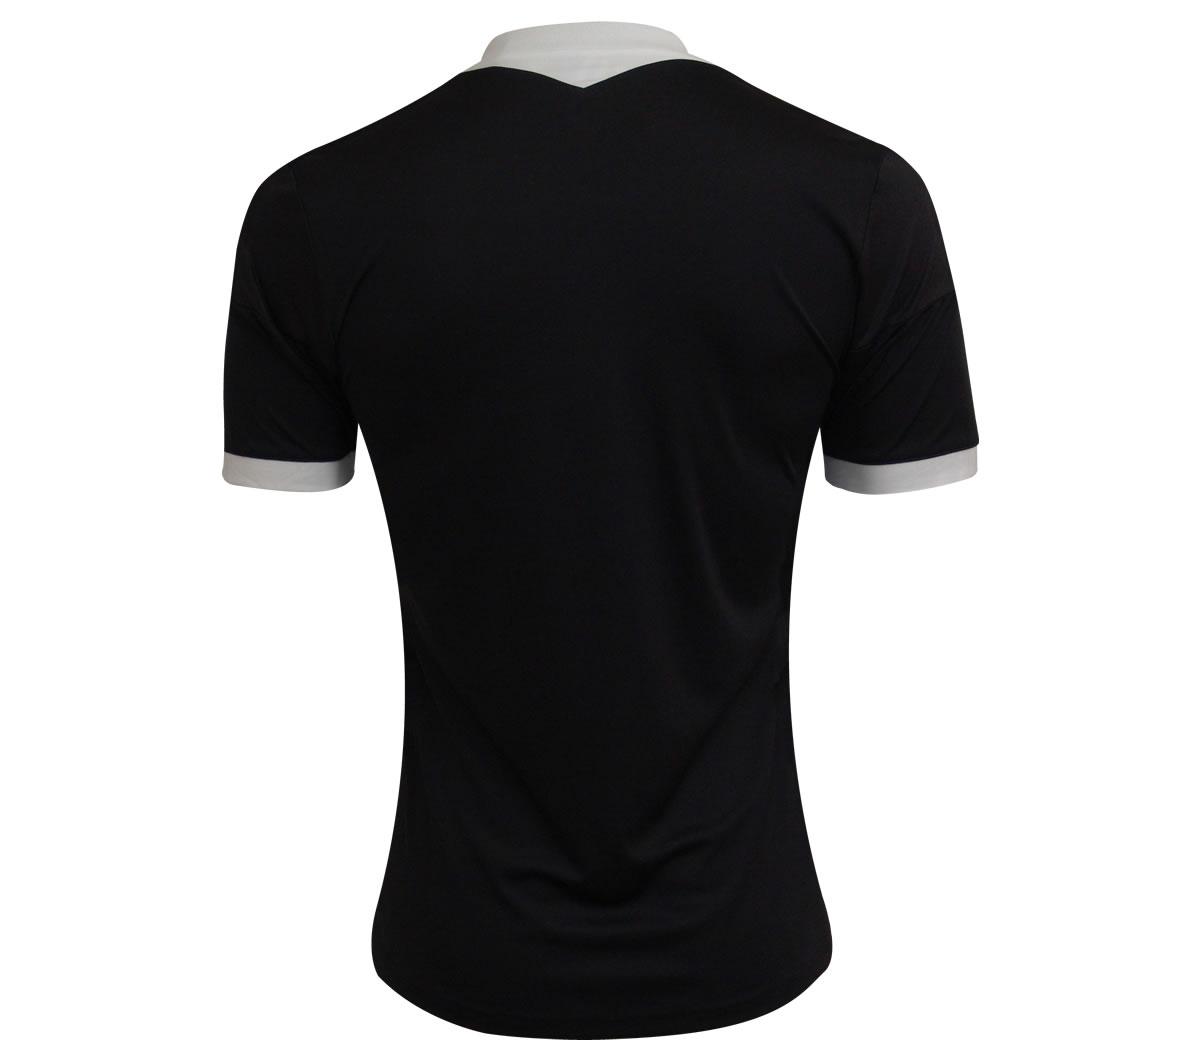 Camisa Adidas Campeon 13 Preta